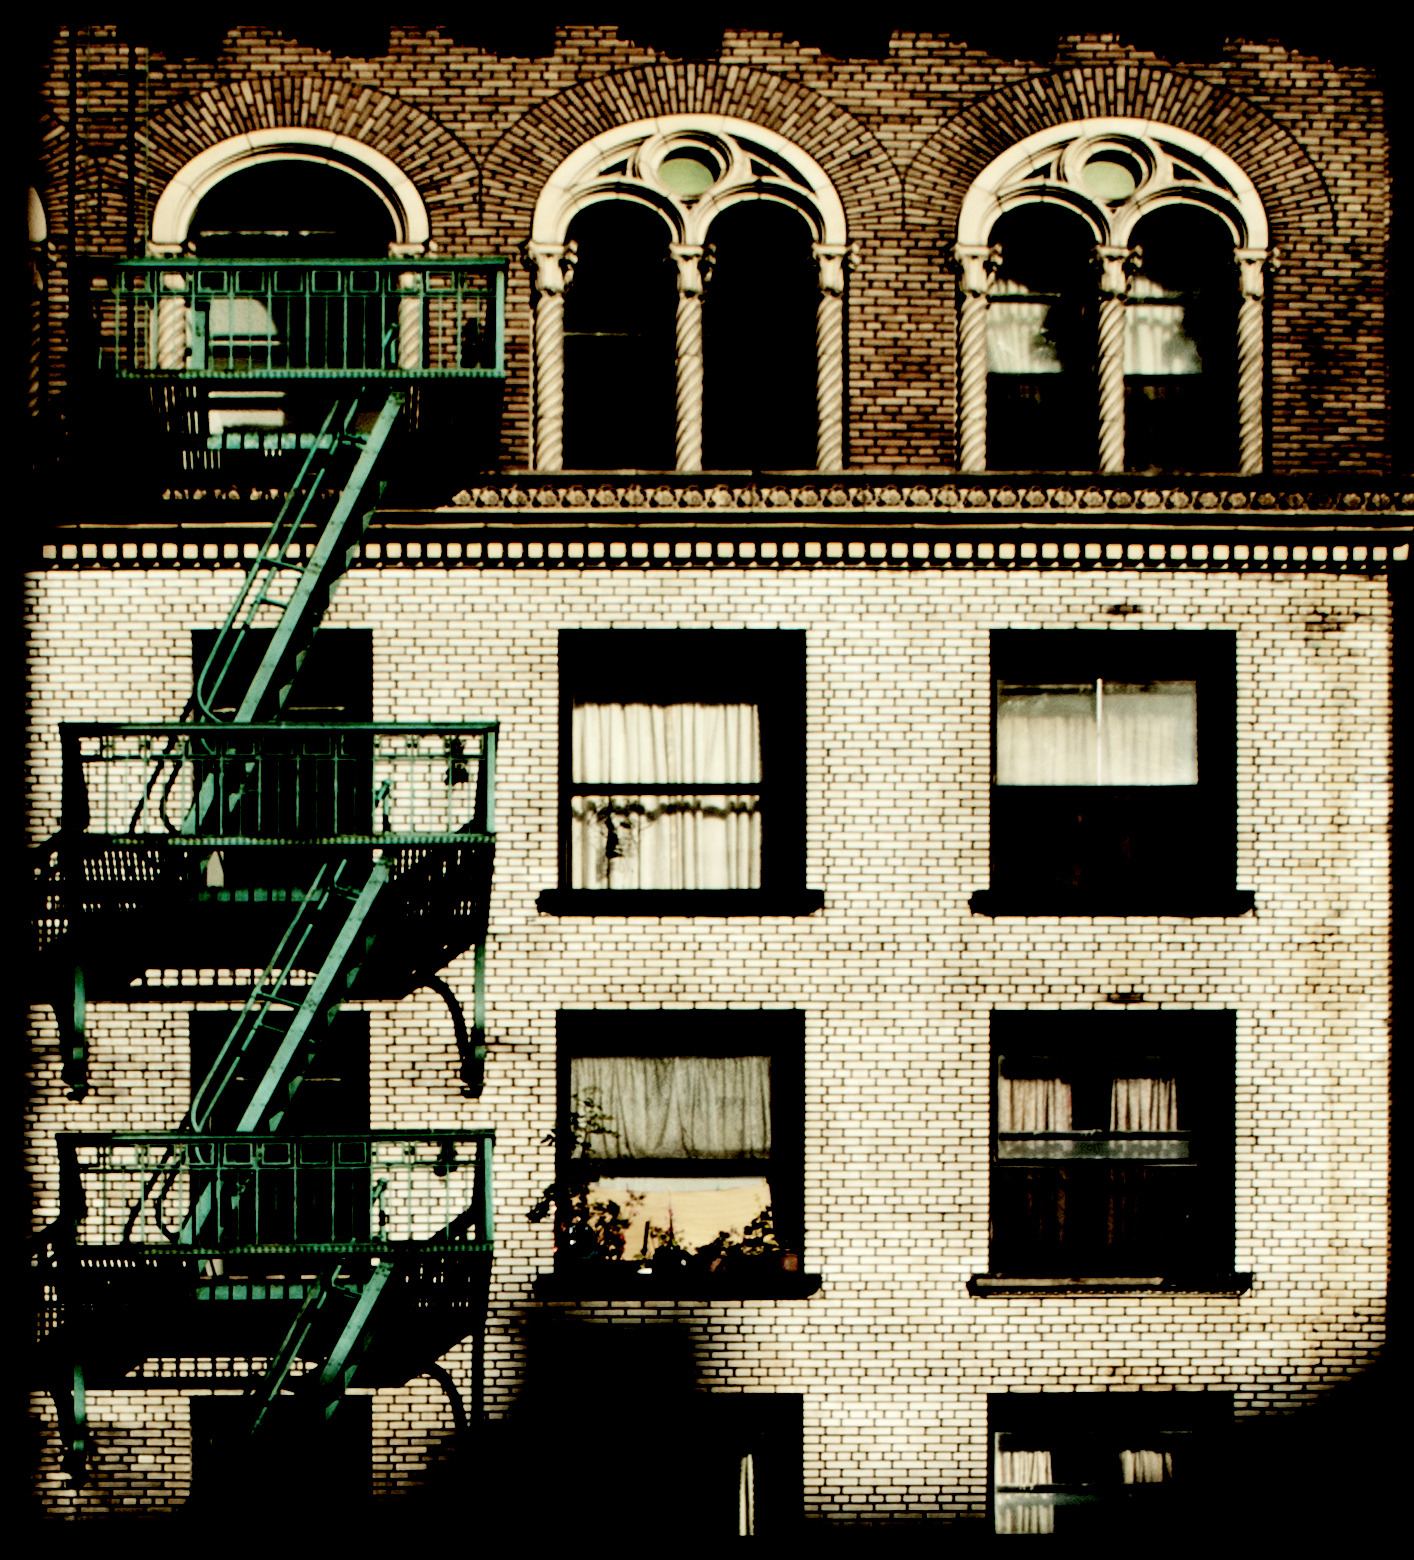 Window+and+Fire+Escape.jpg